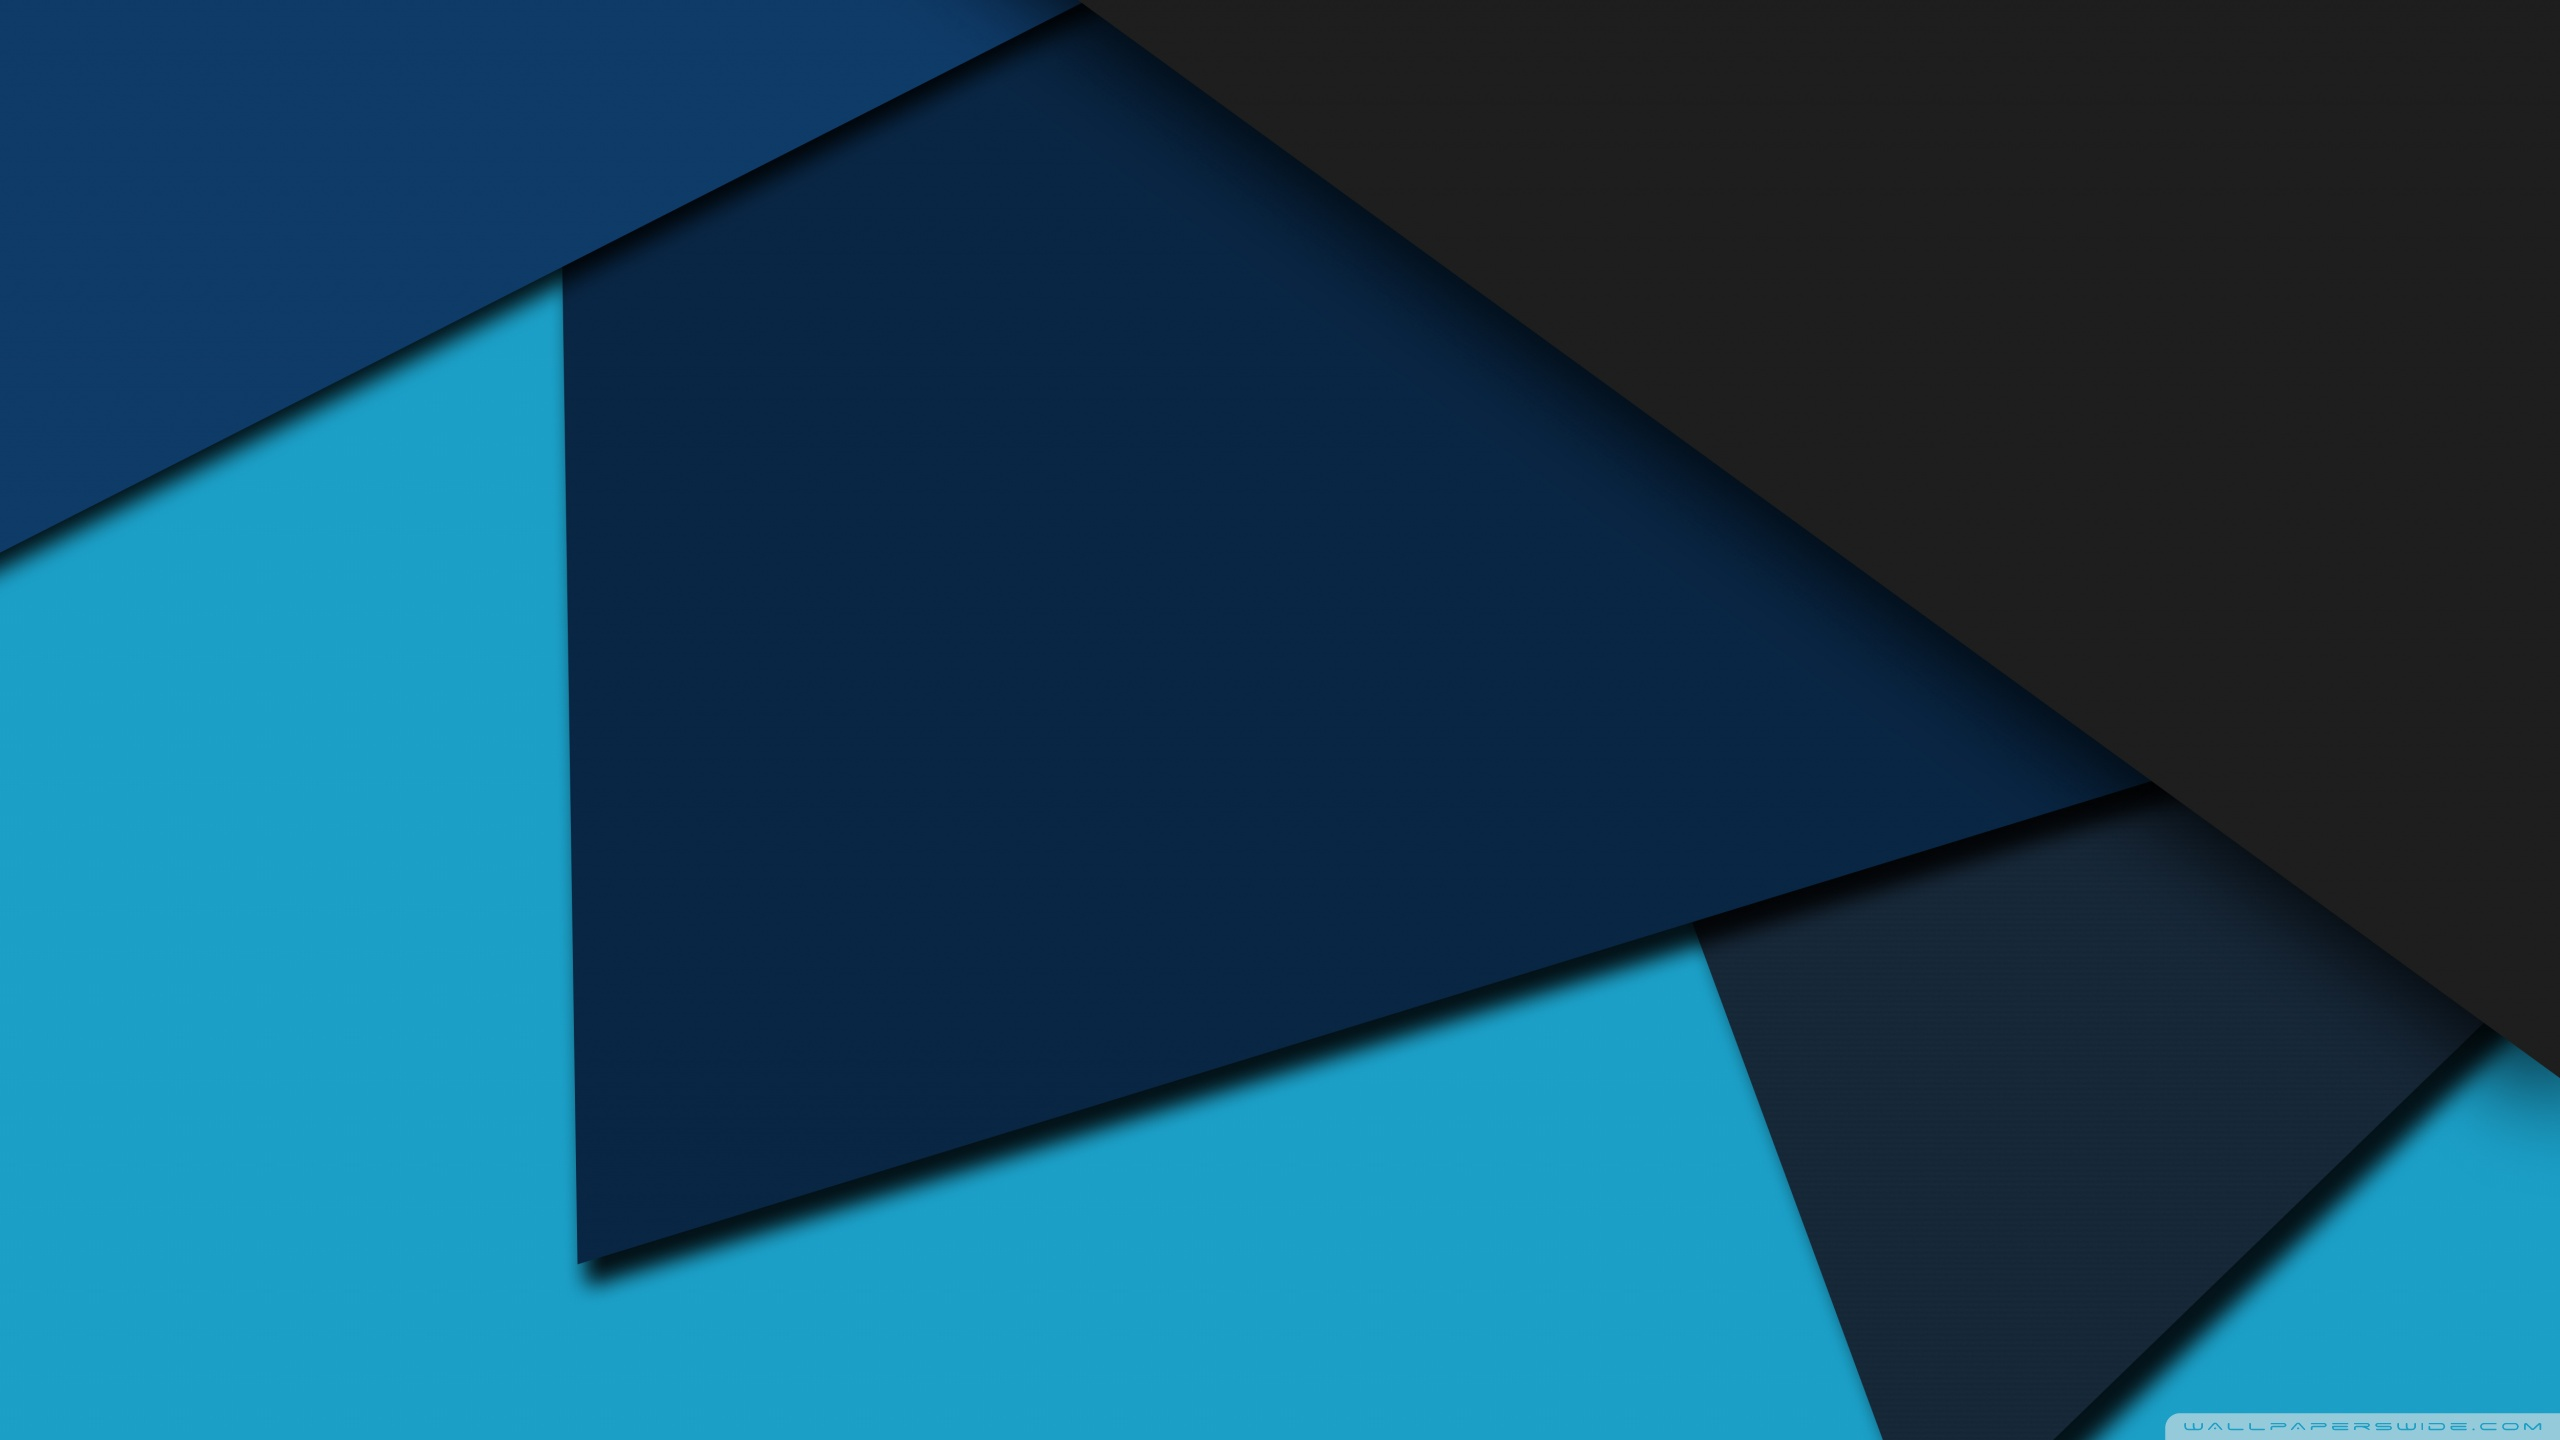 Oppo 3d Wallpaper Material Wallpaper 5 2560x1440